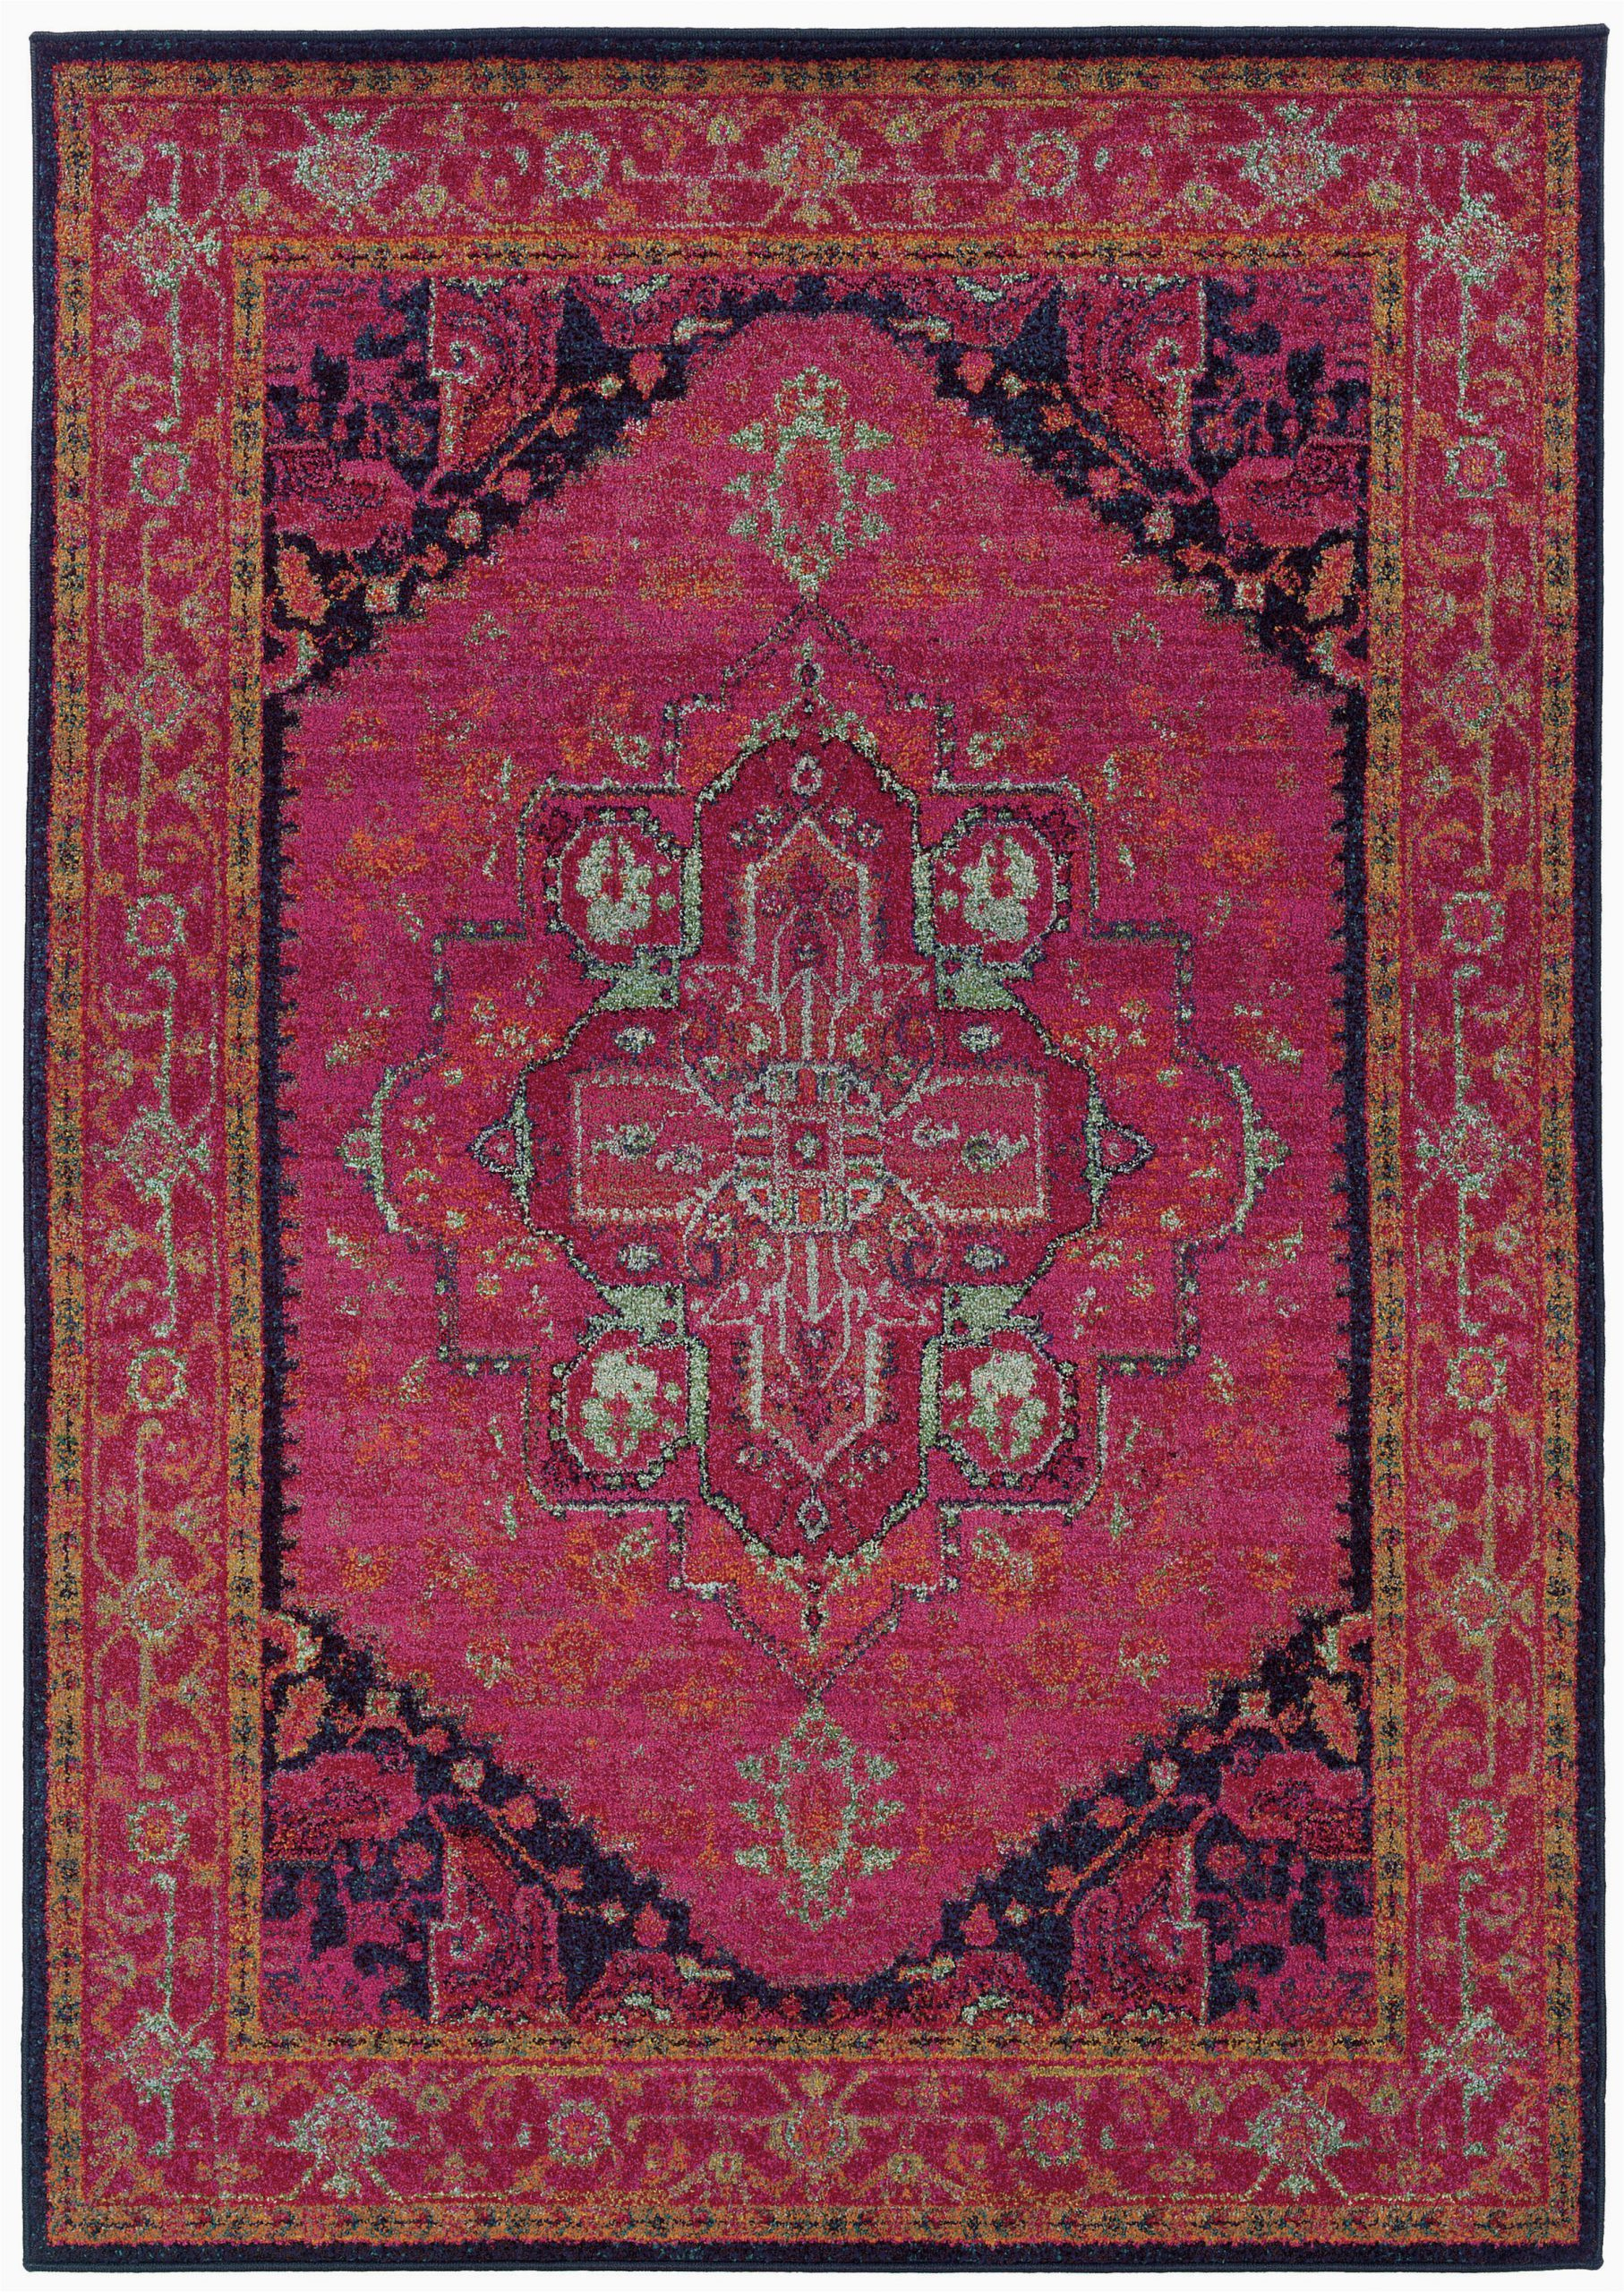 kaleidoscope oriental pinkblackblue area rug